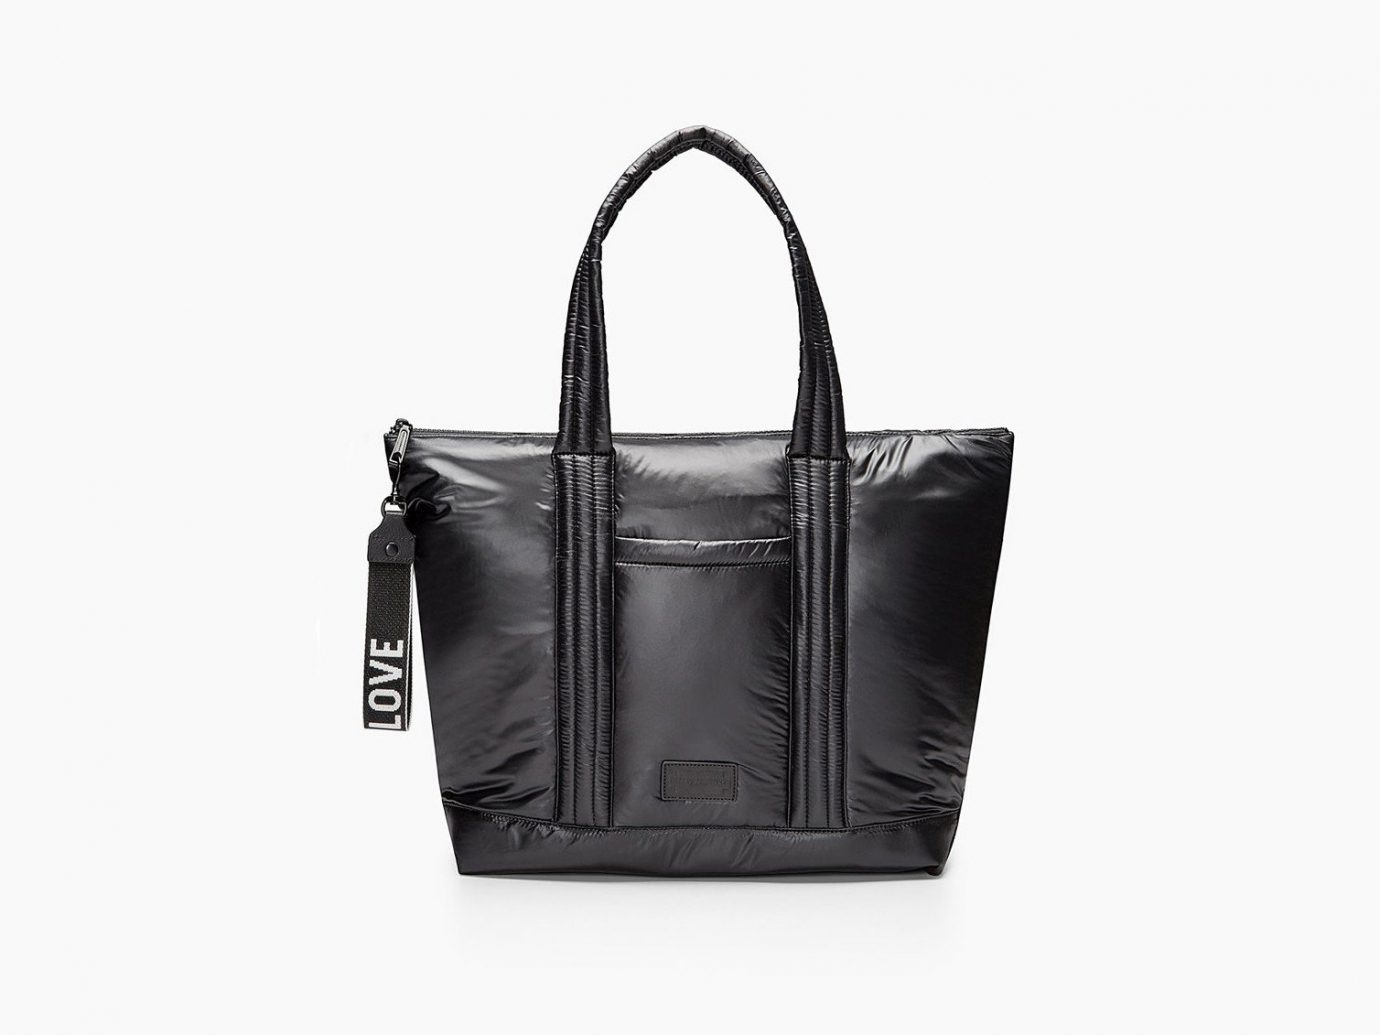 Health + Wellness Style + Design Travel Shop handbag bag black leather fashion accessory shoulder bag product tote bag brand product design luggage & bags strap